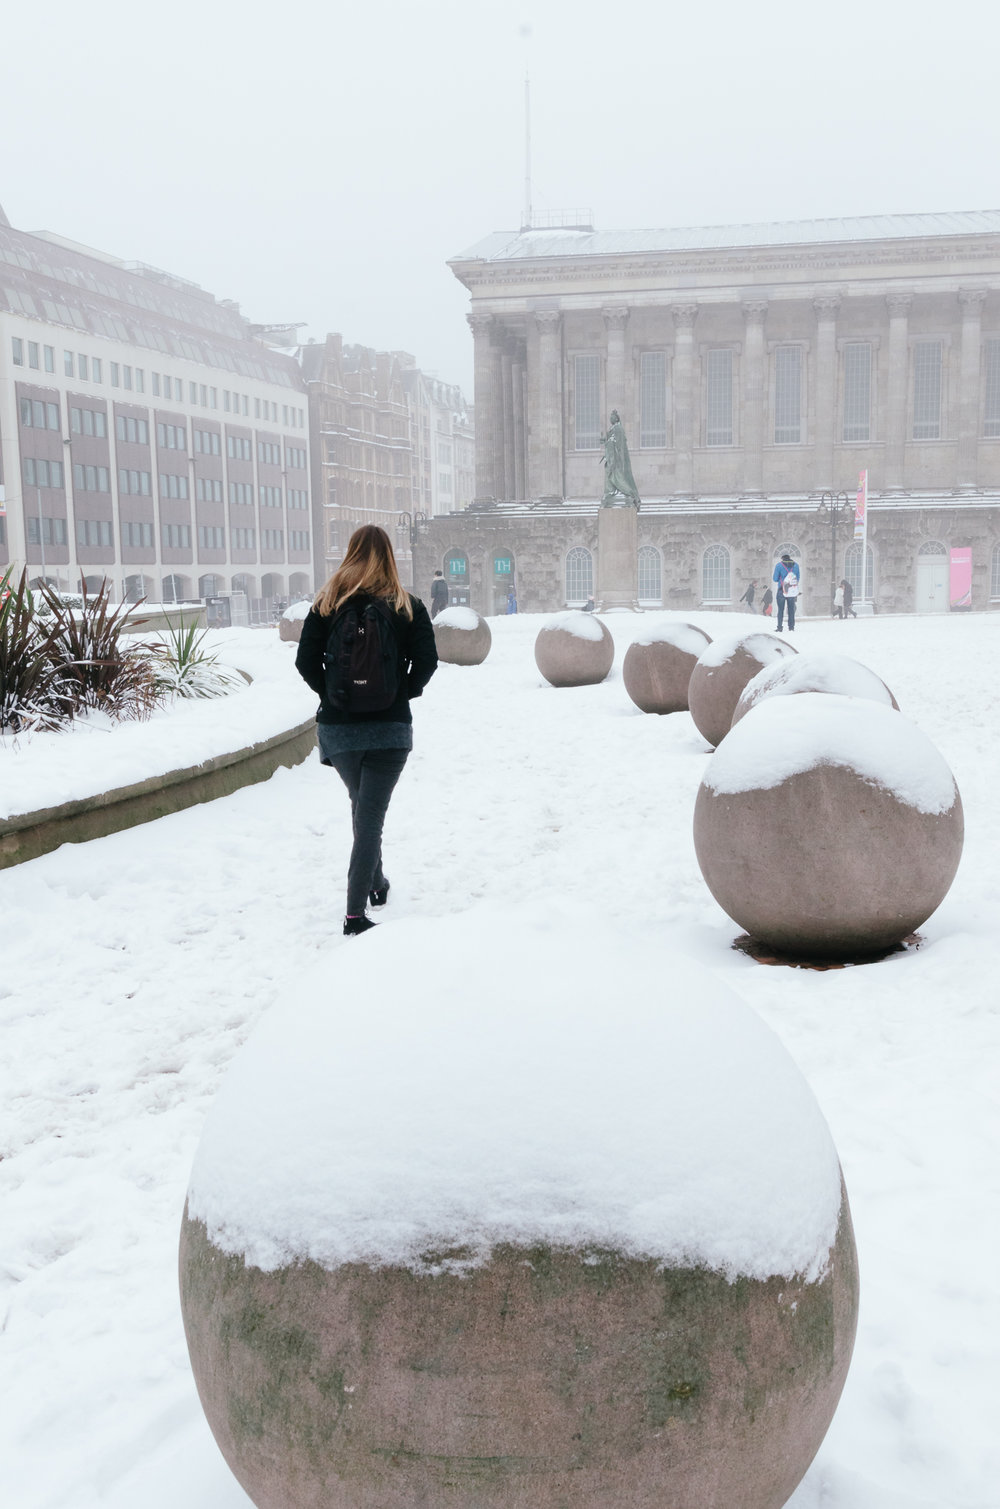 Birmingham-Snow-Fog-Winter-20180303-0041-Hanny-Foxhall.jpg